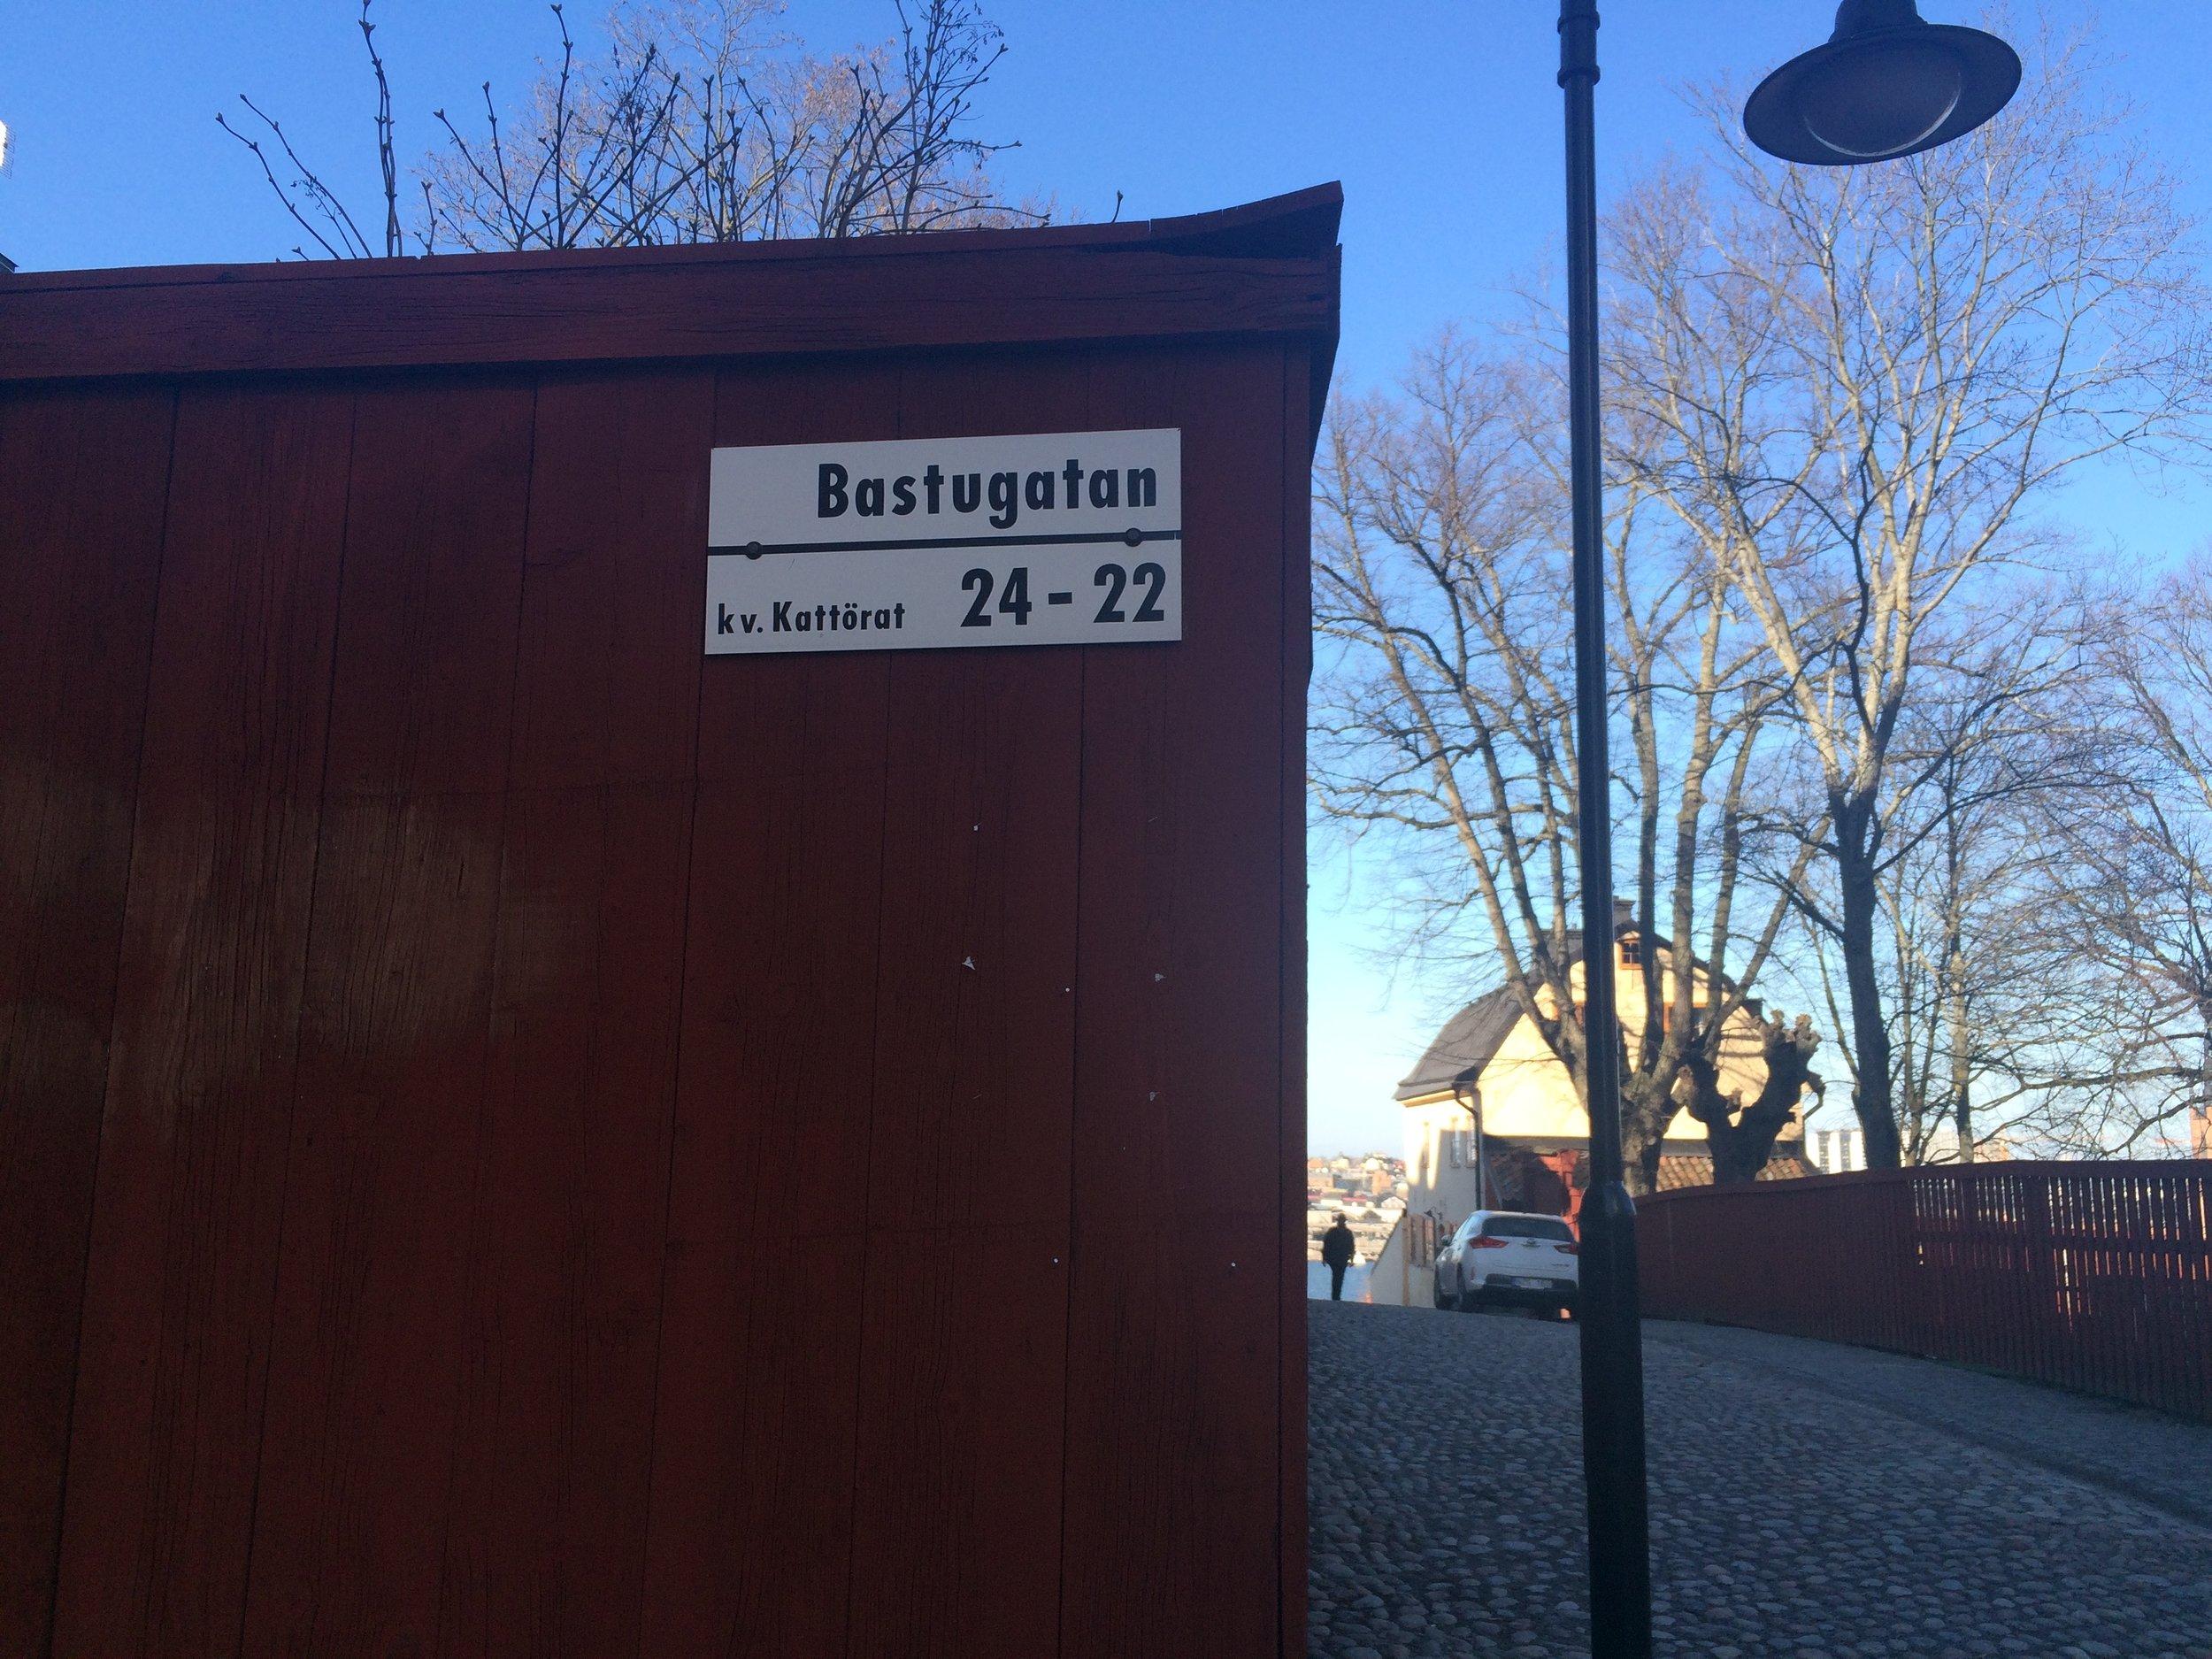 As a Finn I love that name! (Translation Sauna street).